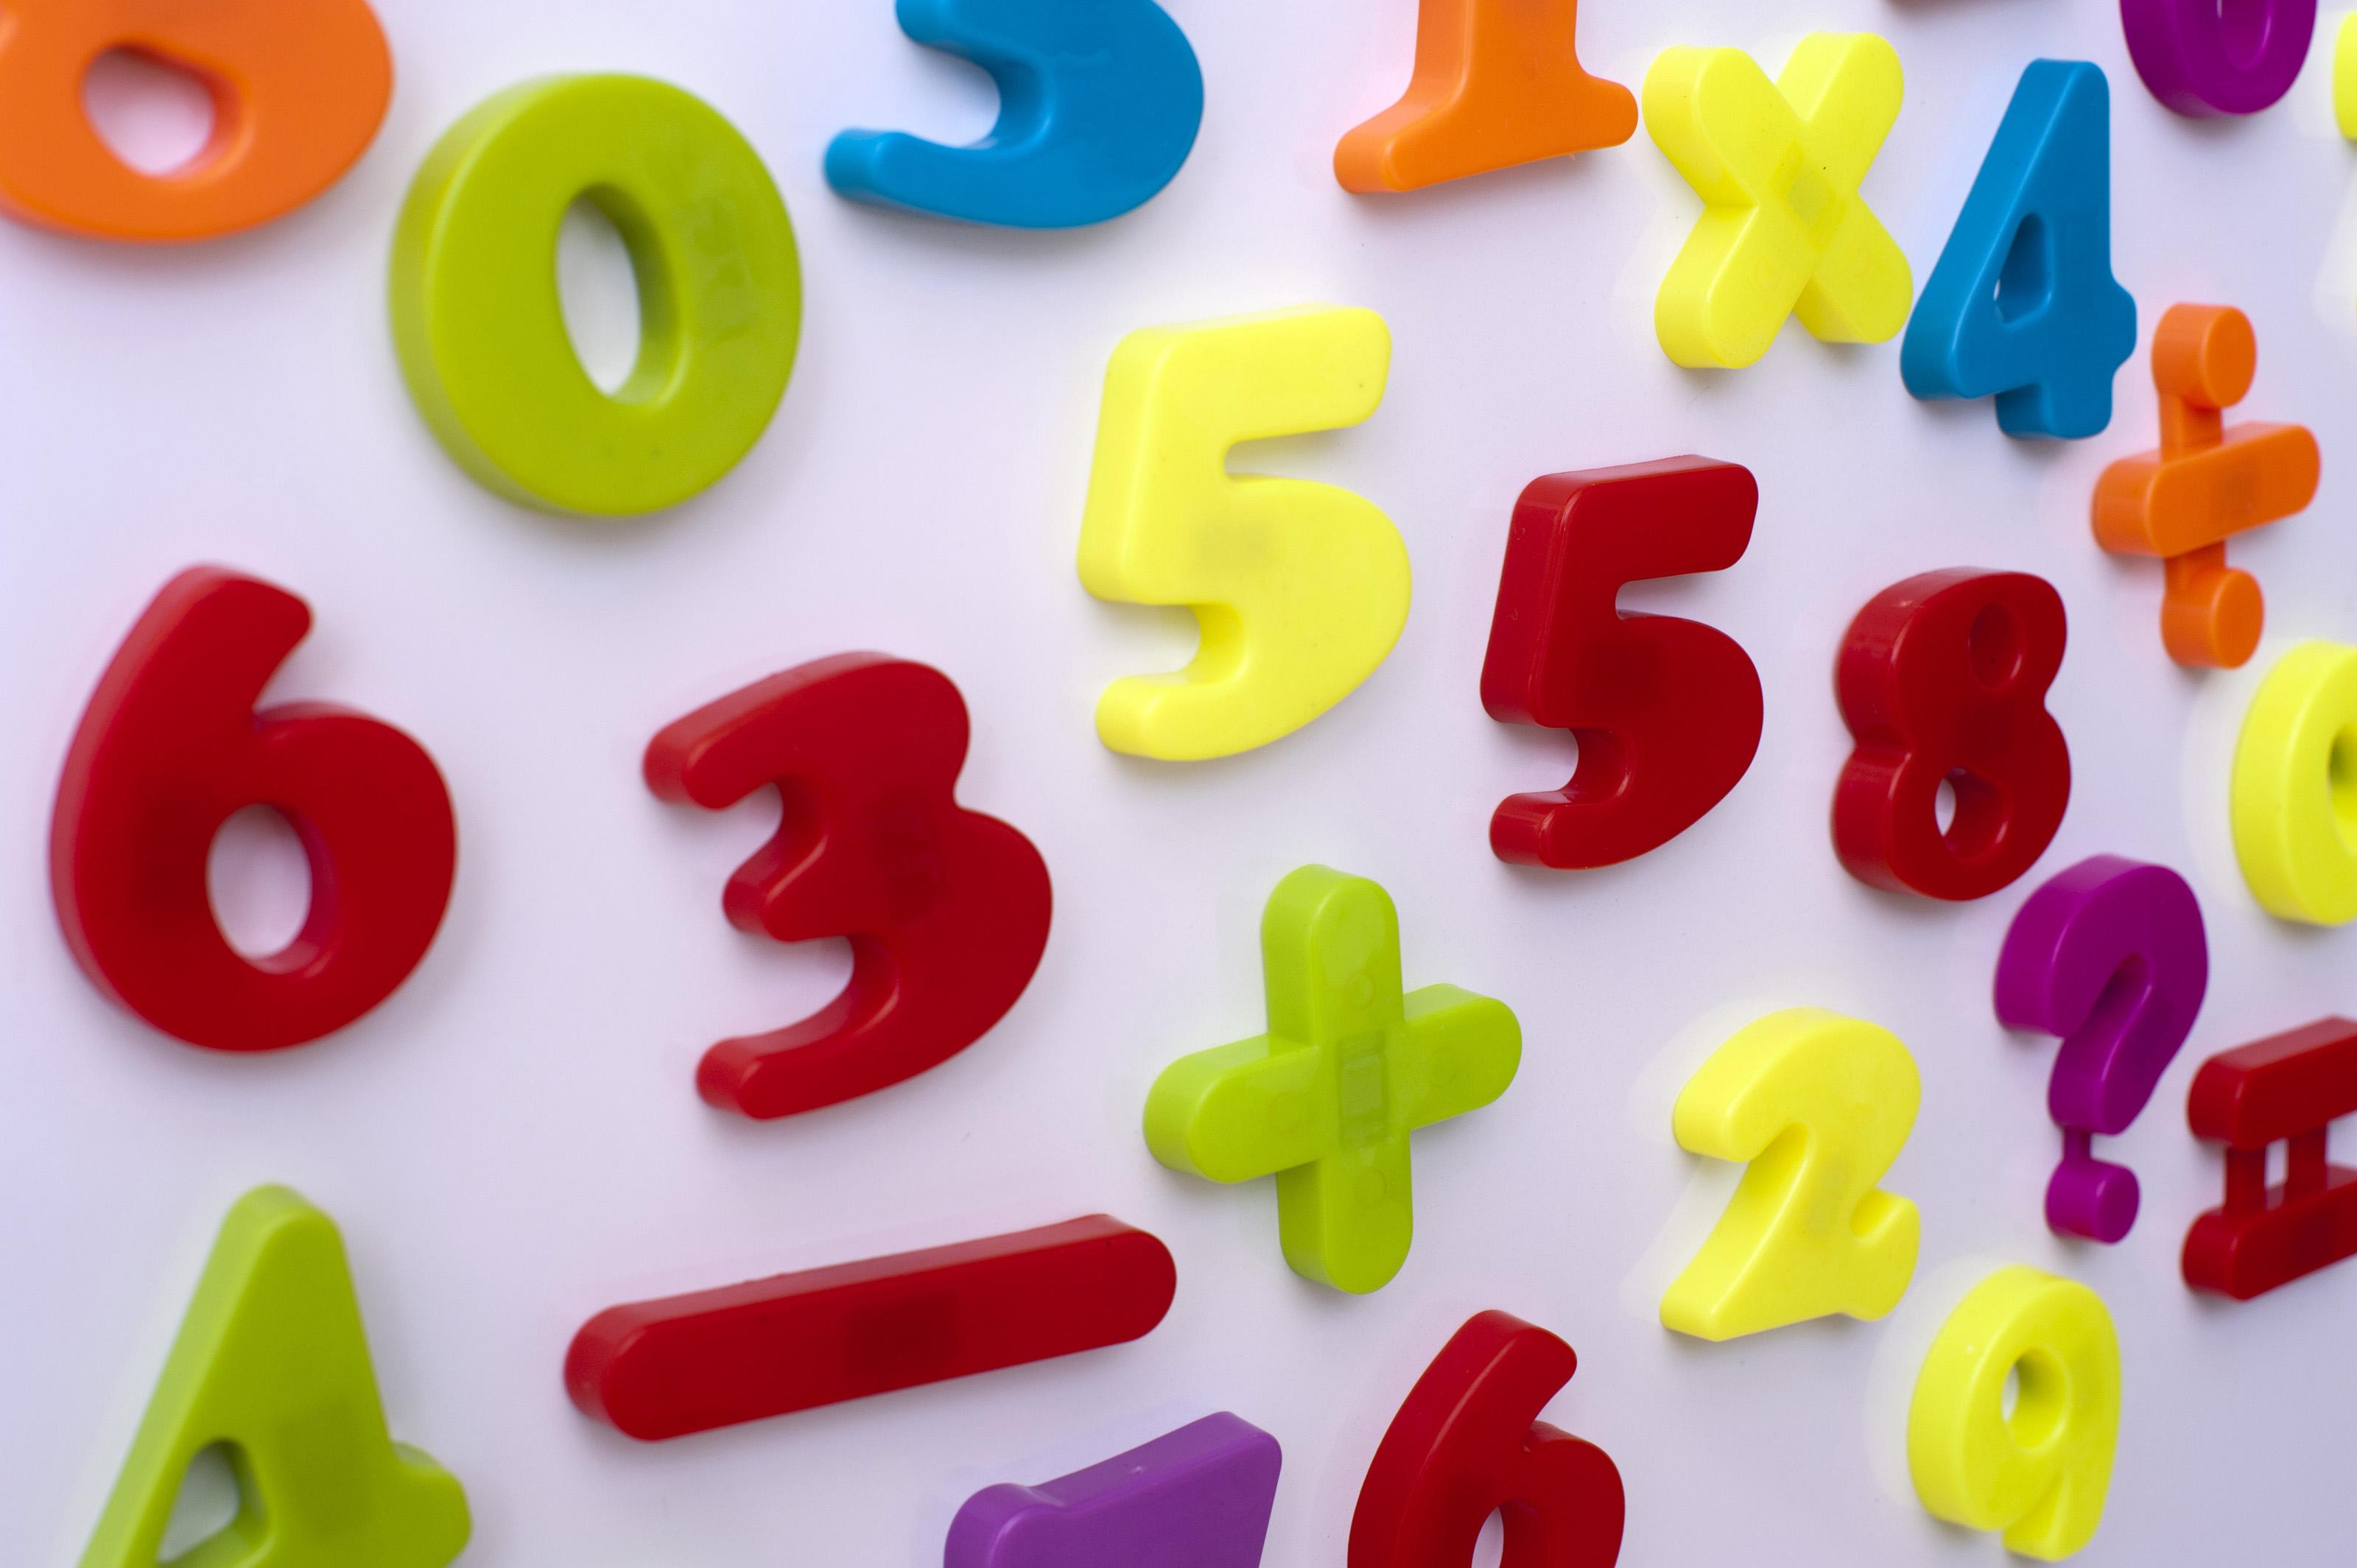 Free Stock Photo Primary School Maths